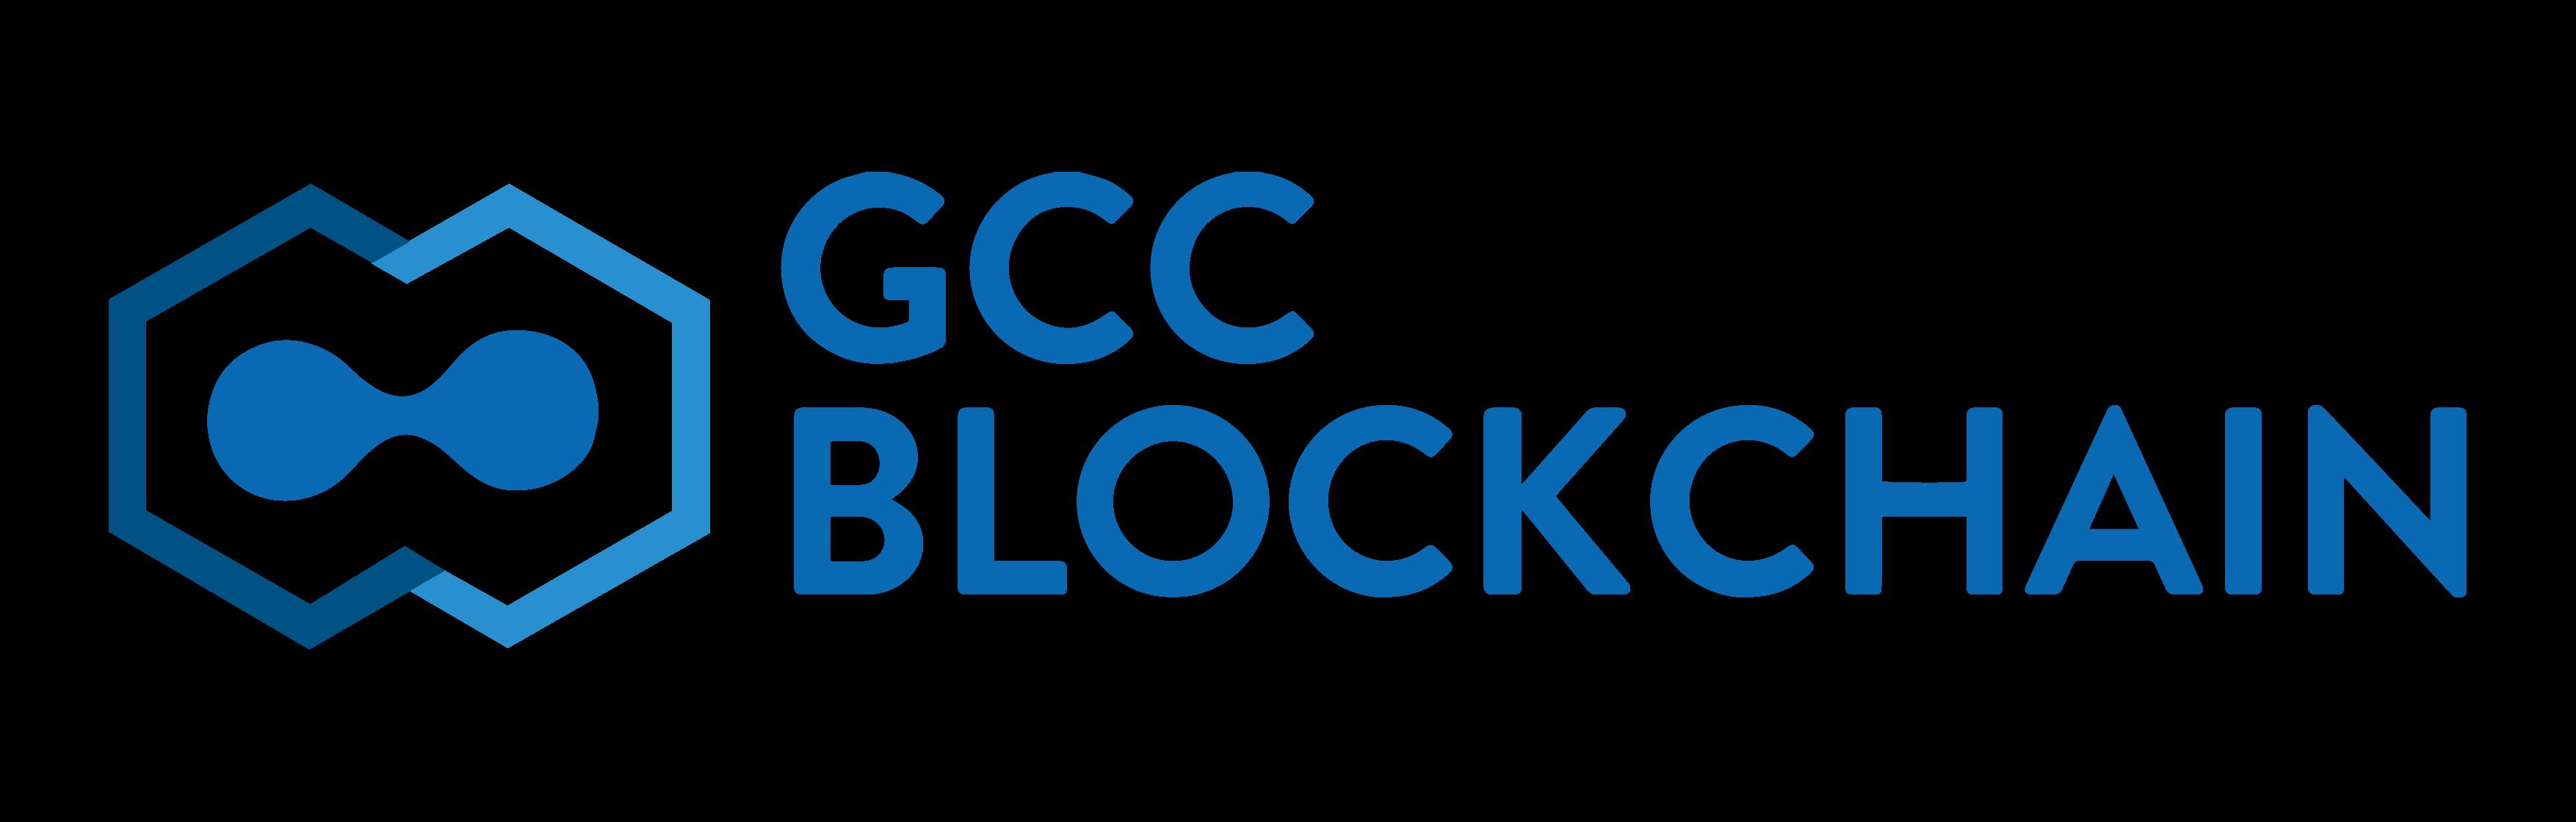 GCC BLOCKCHAIN